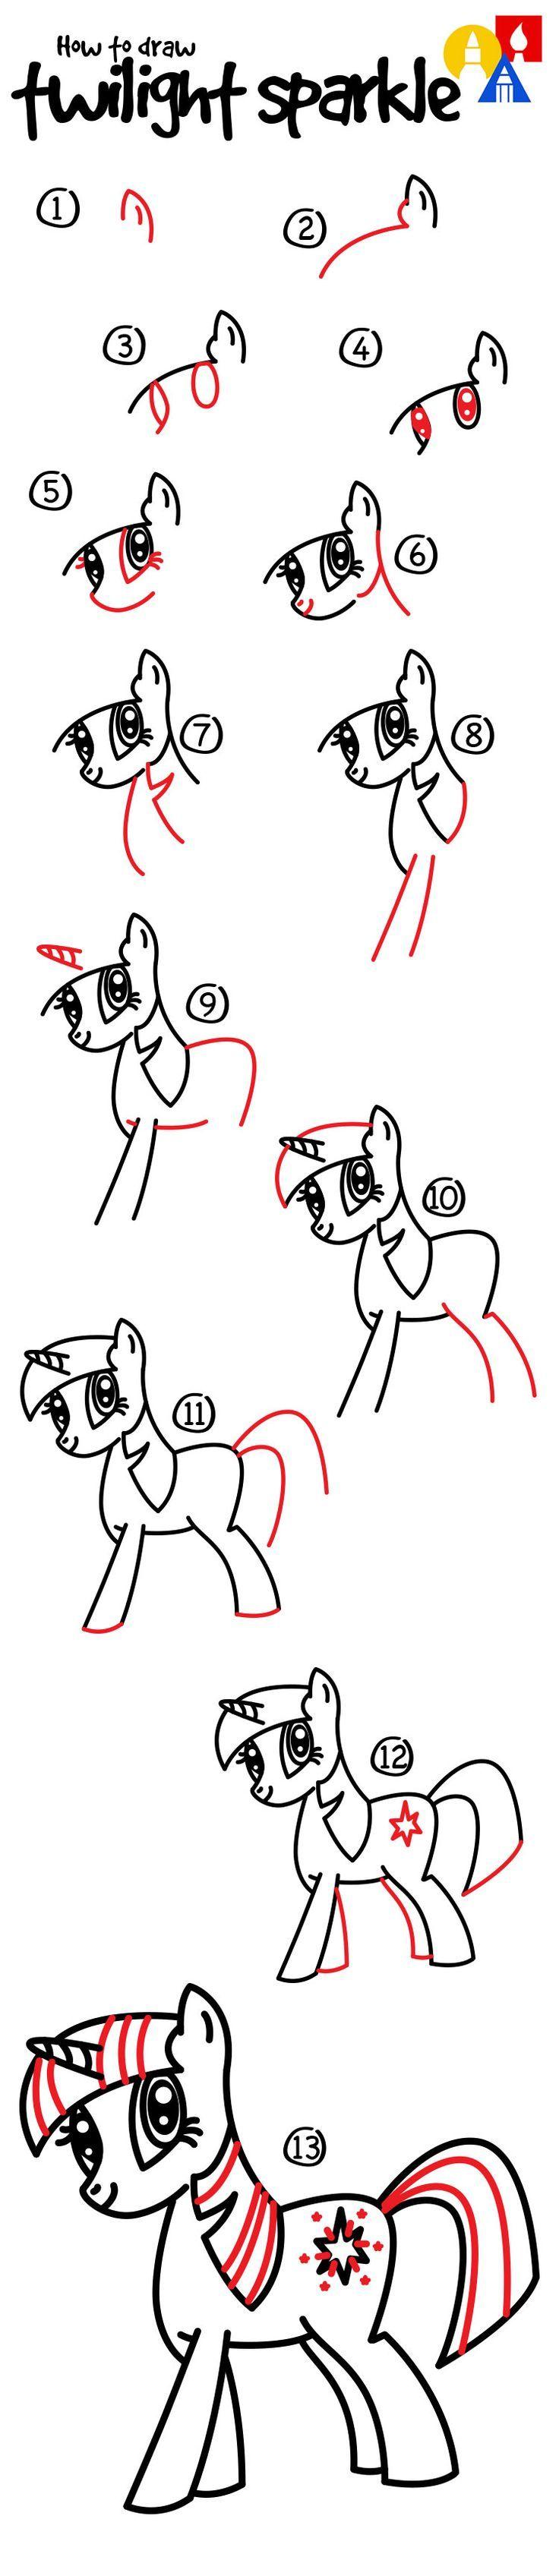 How To Draw Twilight Sparkle  Art For Kids Hub